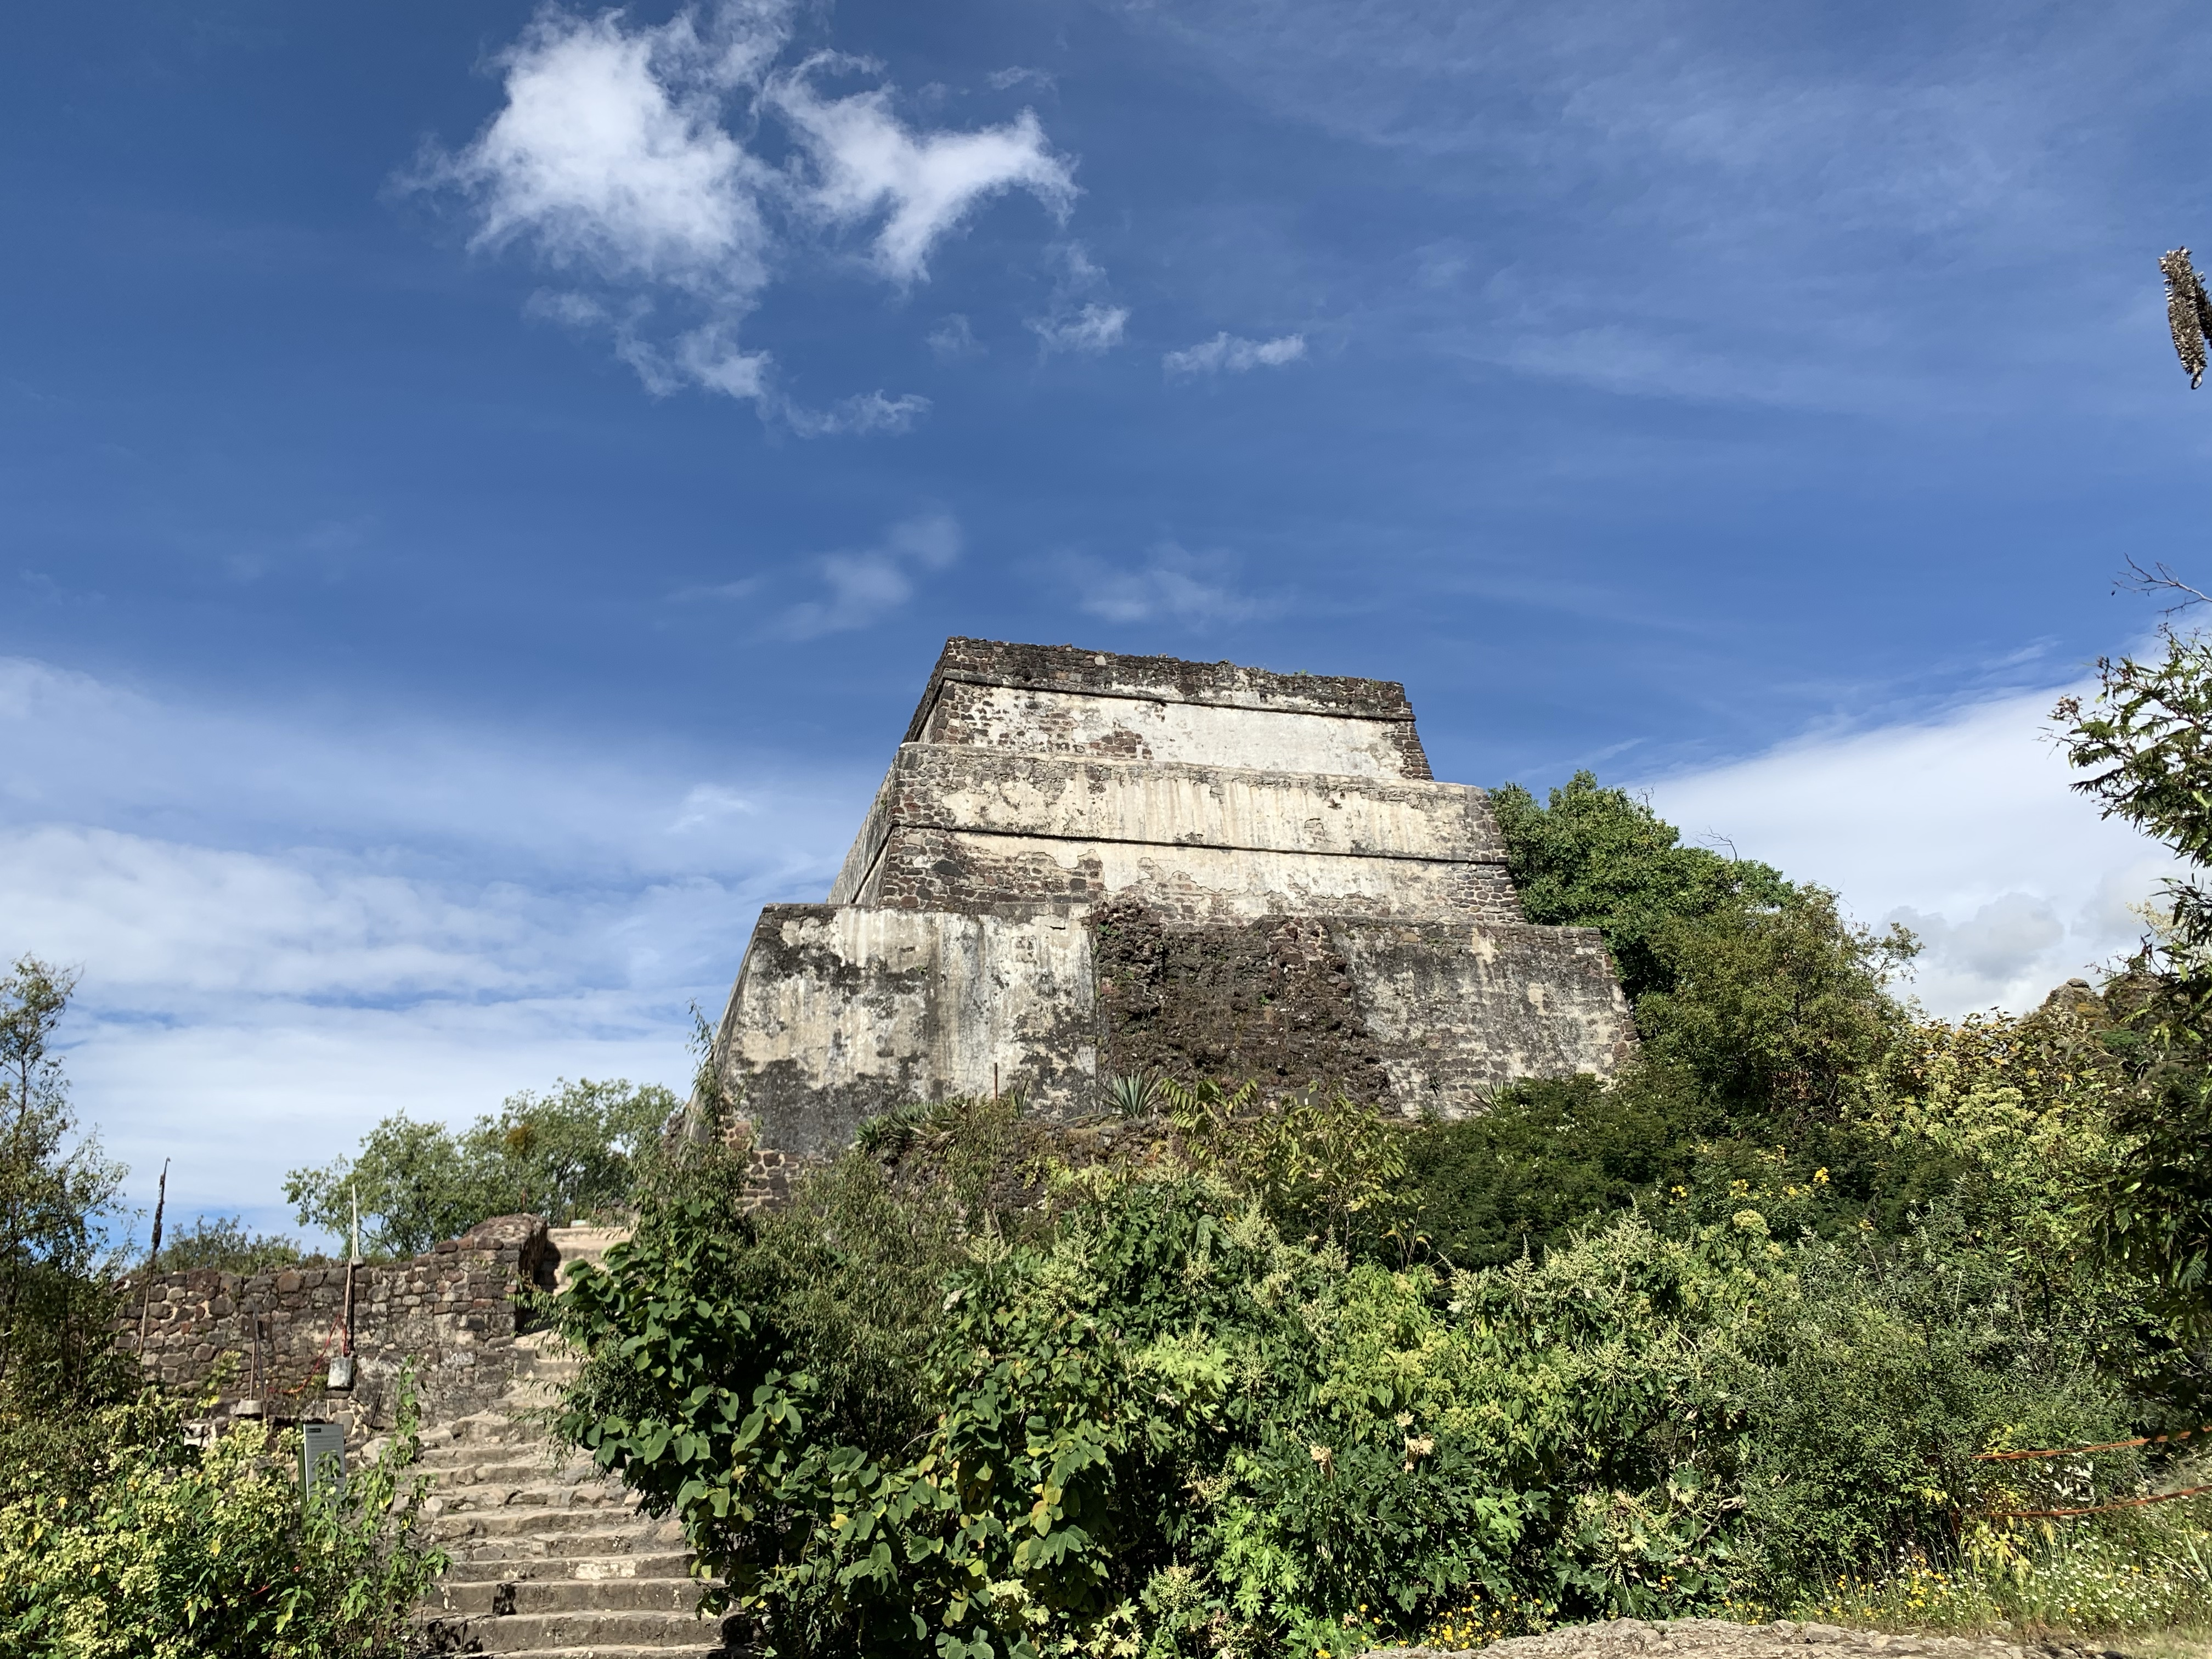 Pirámide Tepozteco